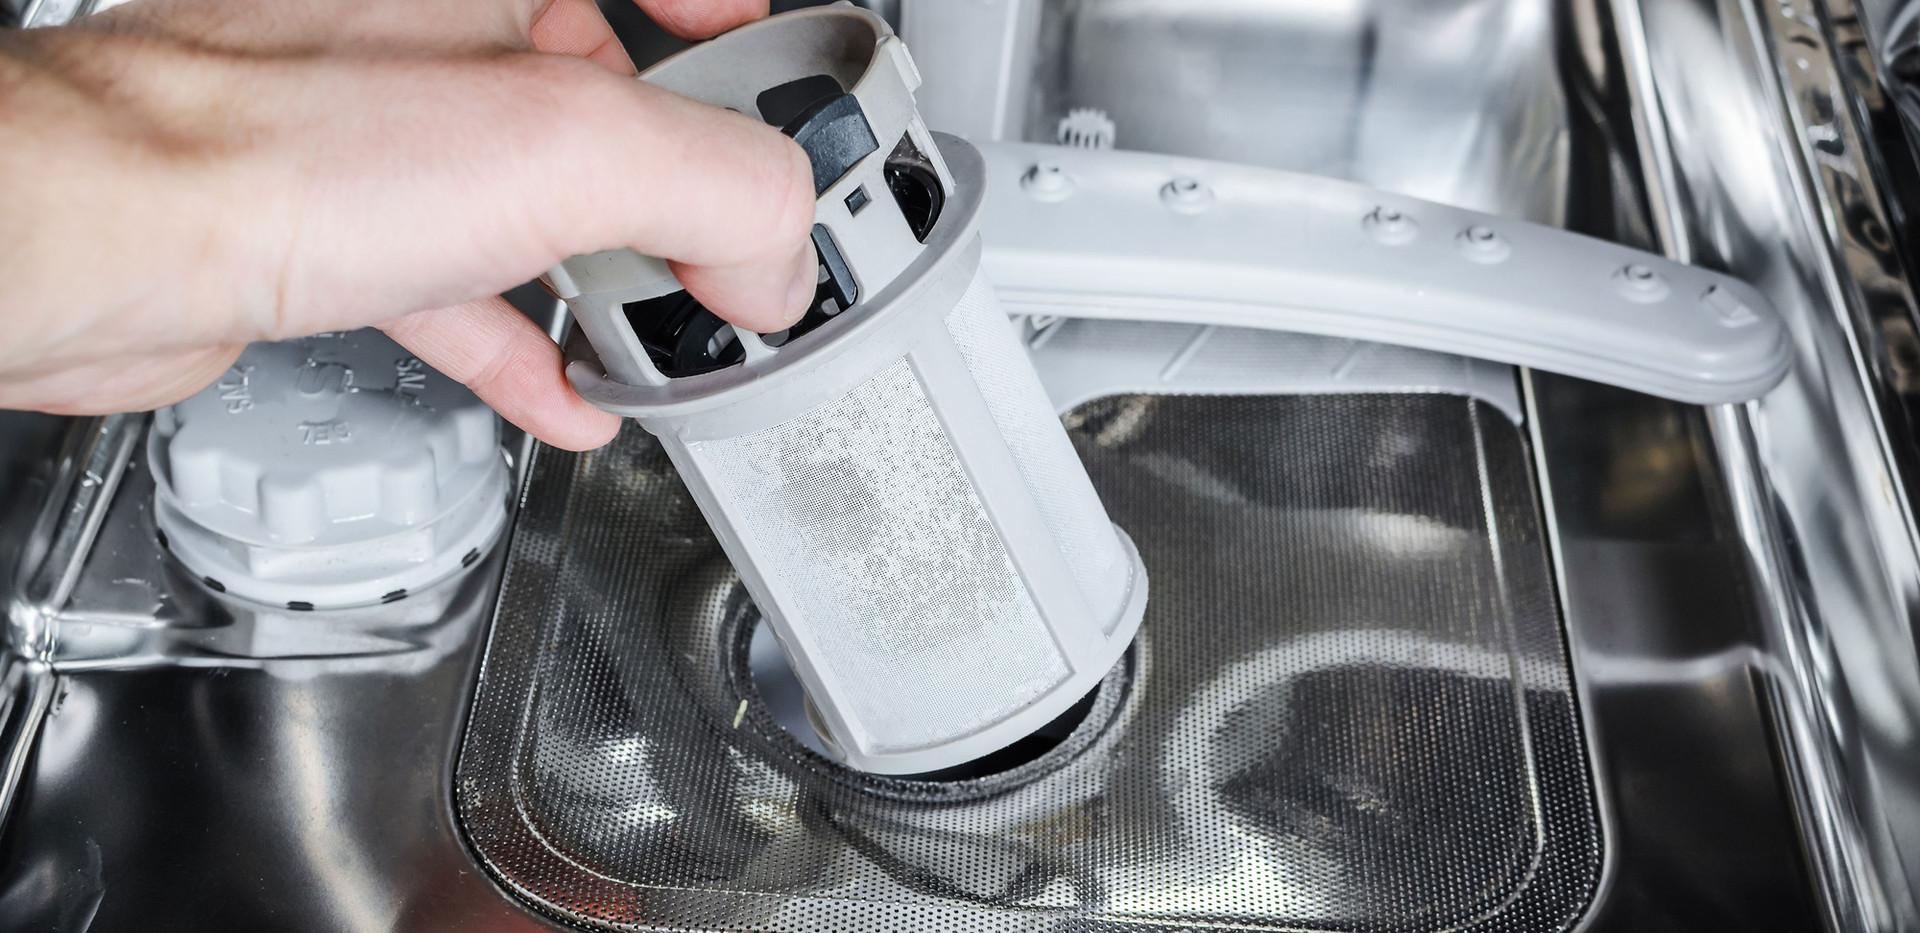 Filtro para máquina de lavar louça